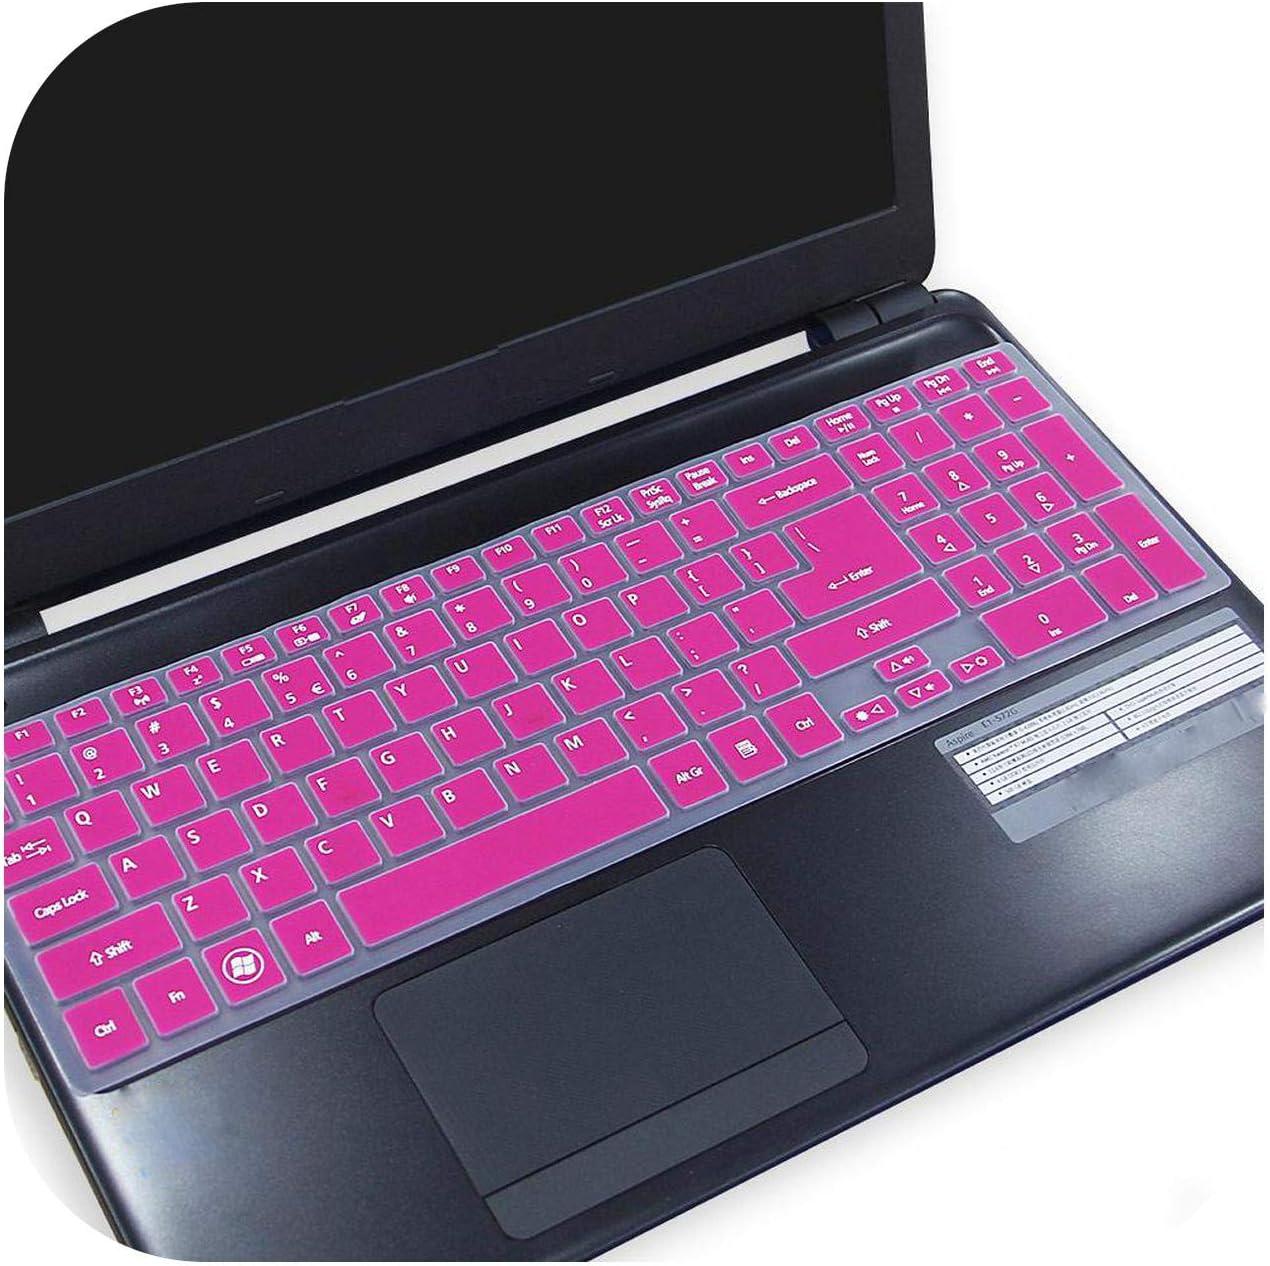 for Acer Aspire V5-561 V5-561Pg V5-561G V5-561P E5-731 E5-771 E5-771G V3-731 V3-731G 15.6 17.3 Keyboard Cover Protector Skin-Rose-